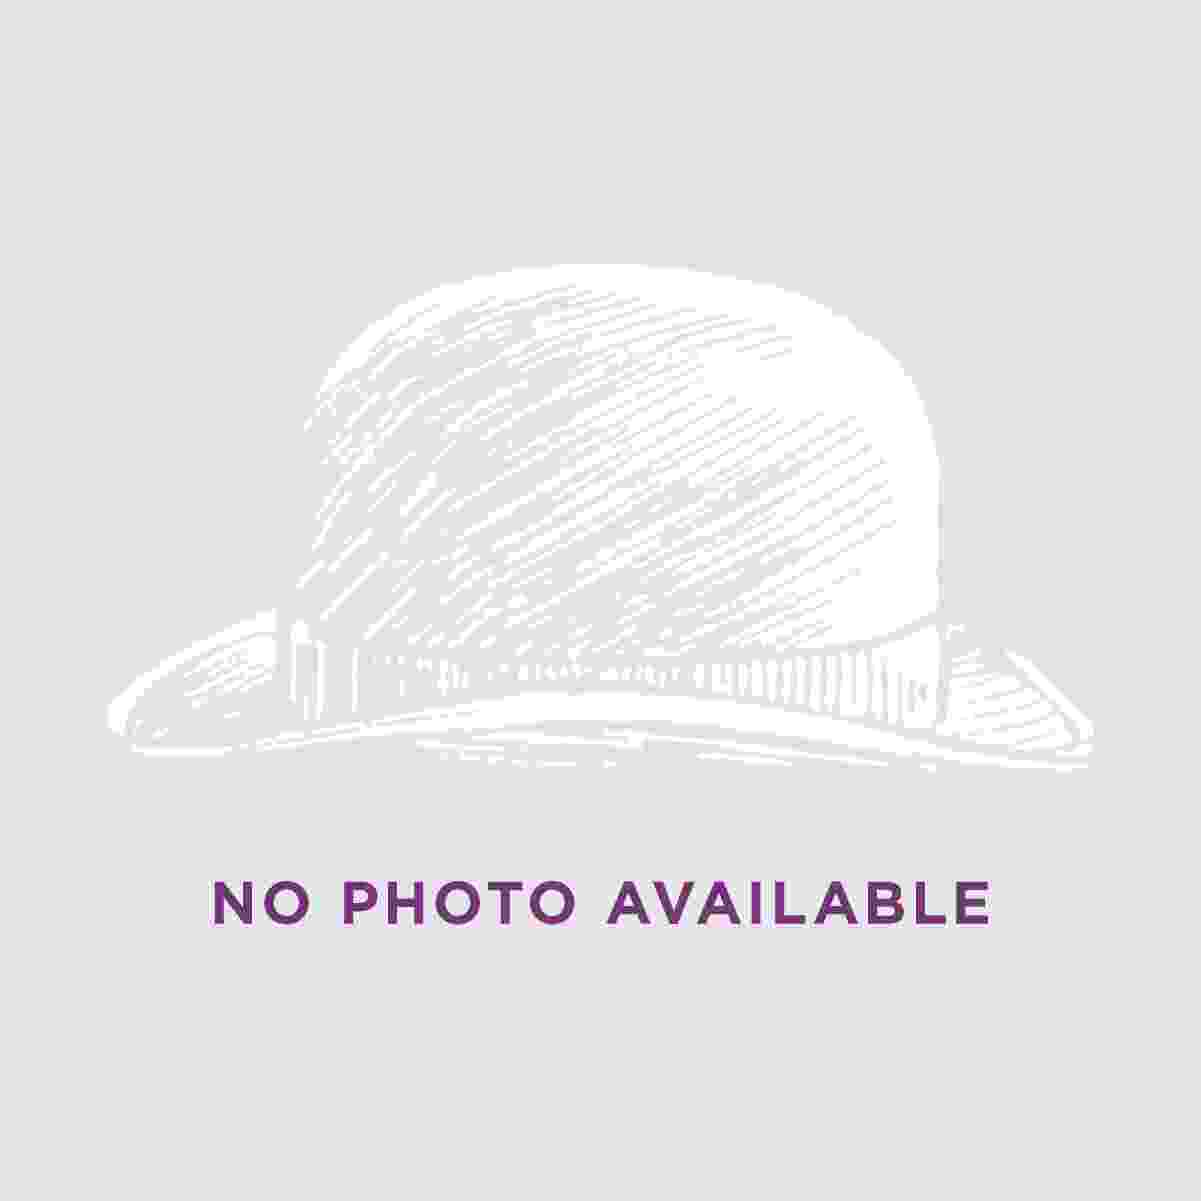 New York Hat & Cap 6 Panel Beanie - Leather